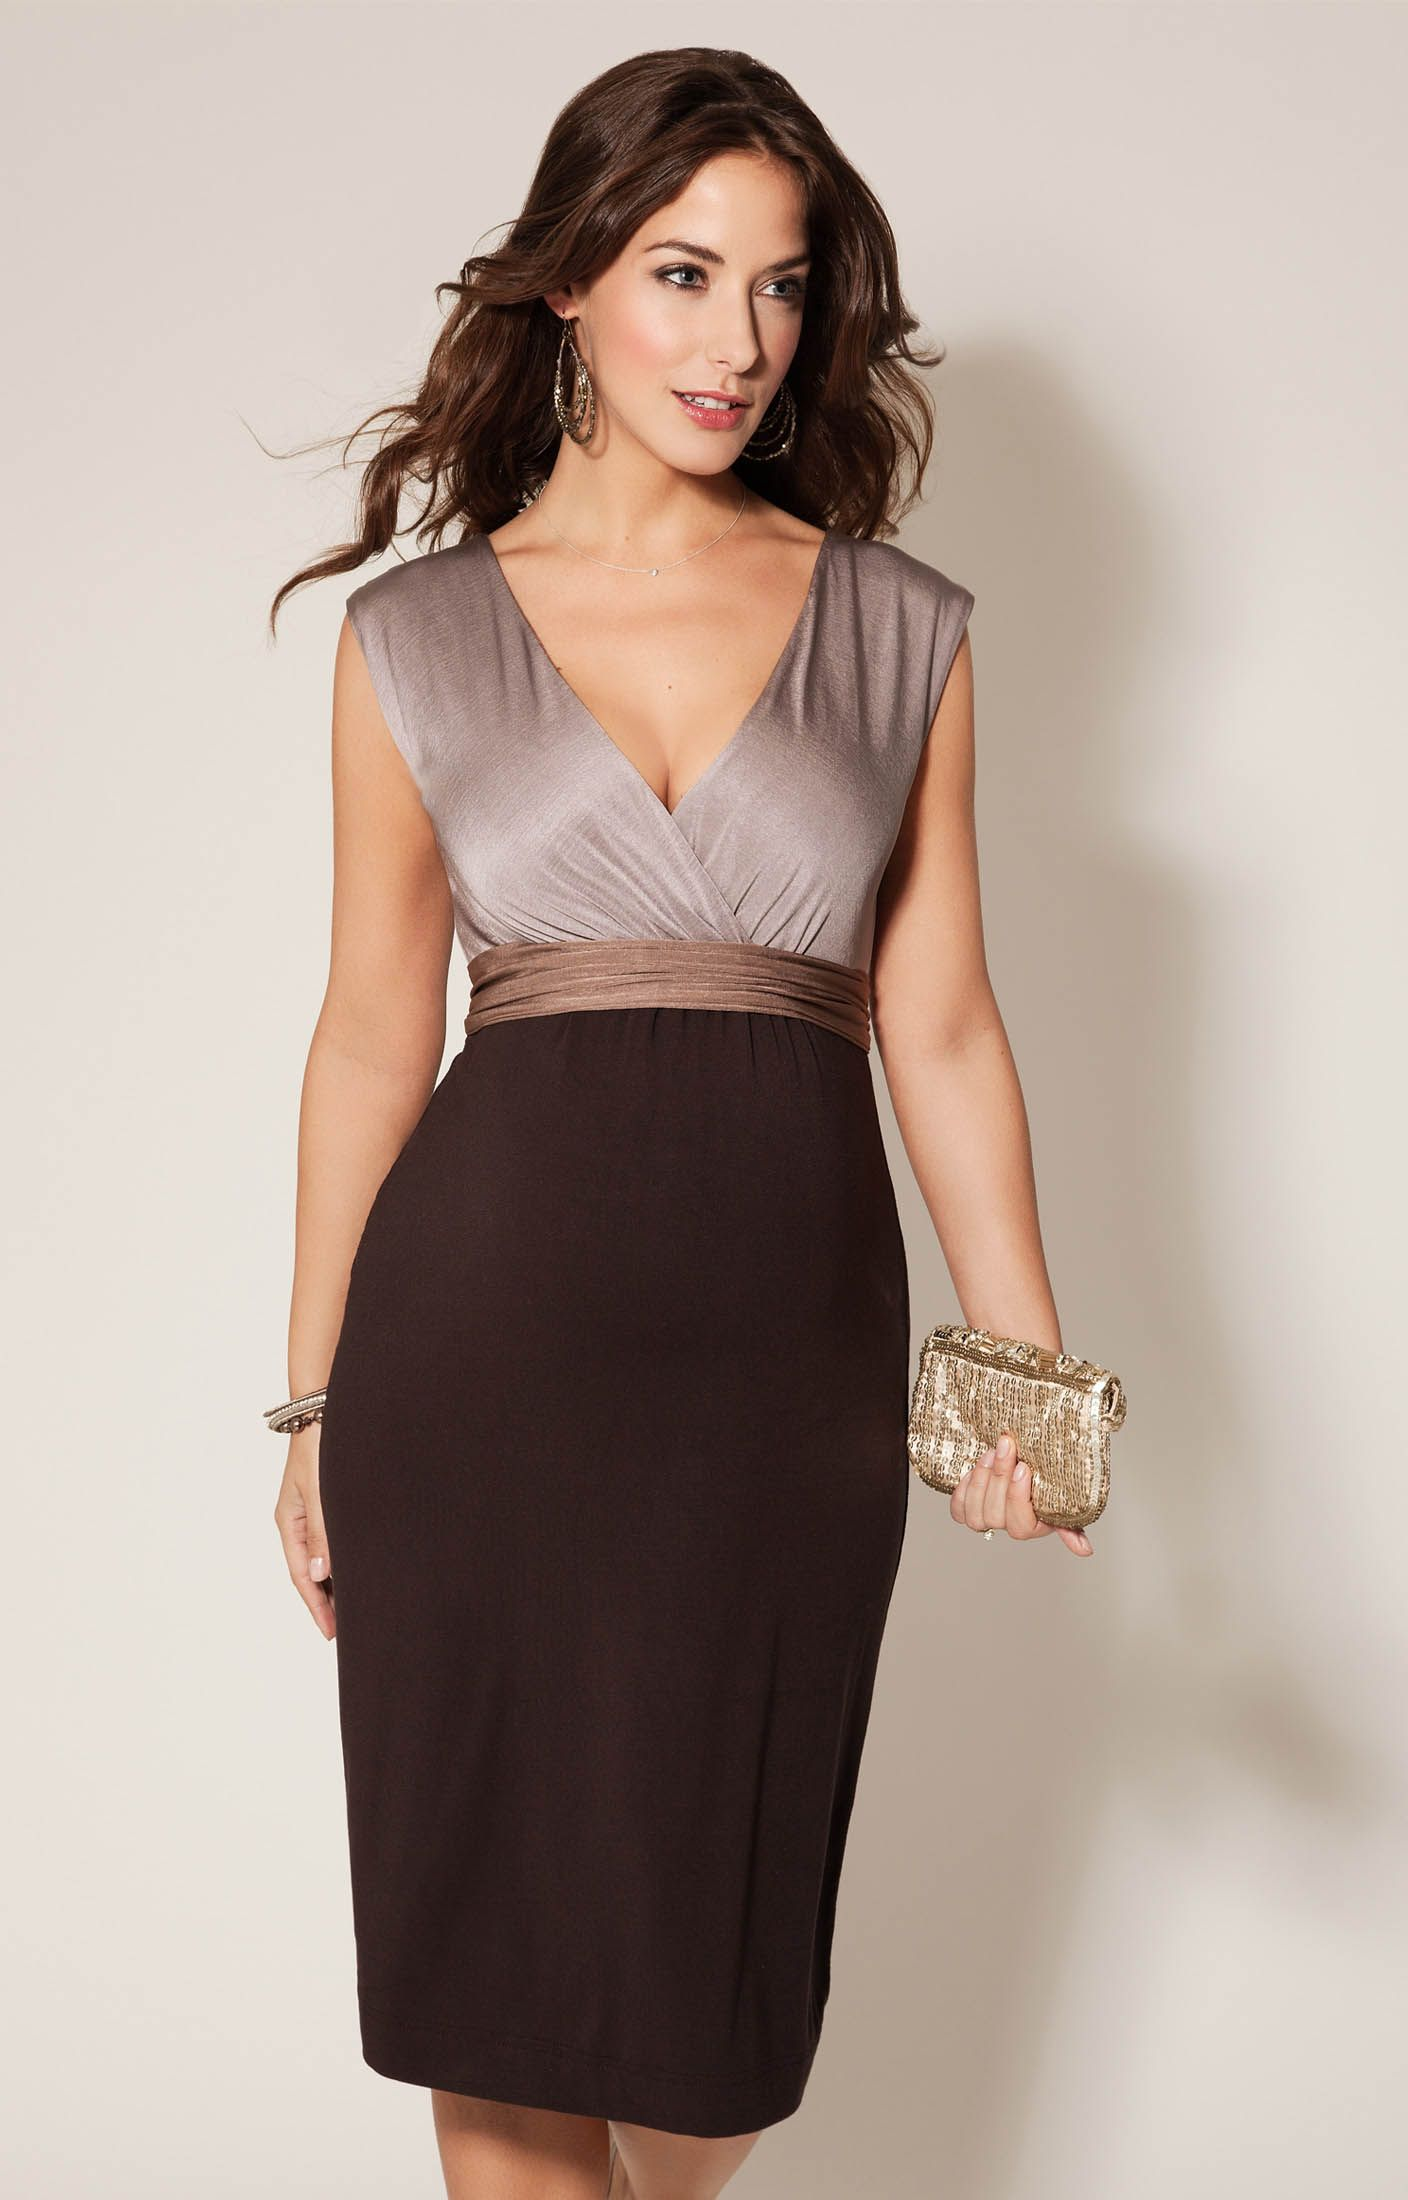 c9b92292b4c Jewel Block Maternity Dress Coffee Bean by Tiffany Rose